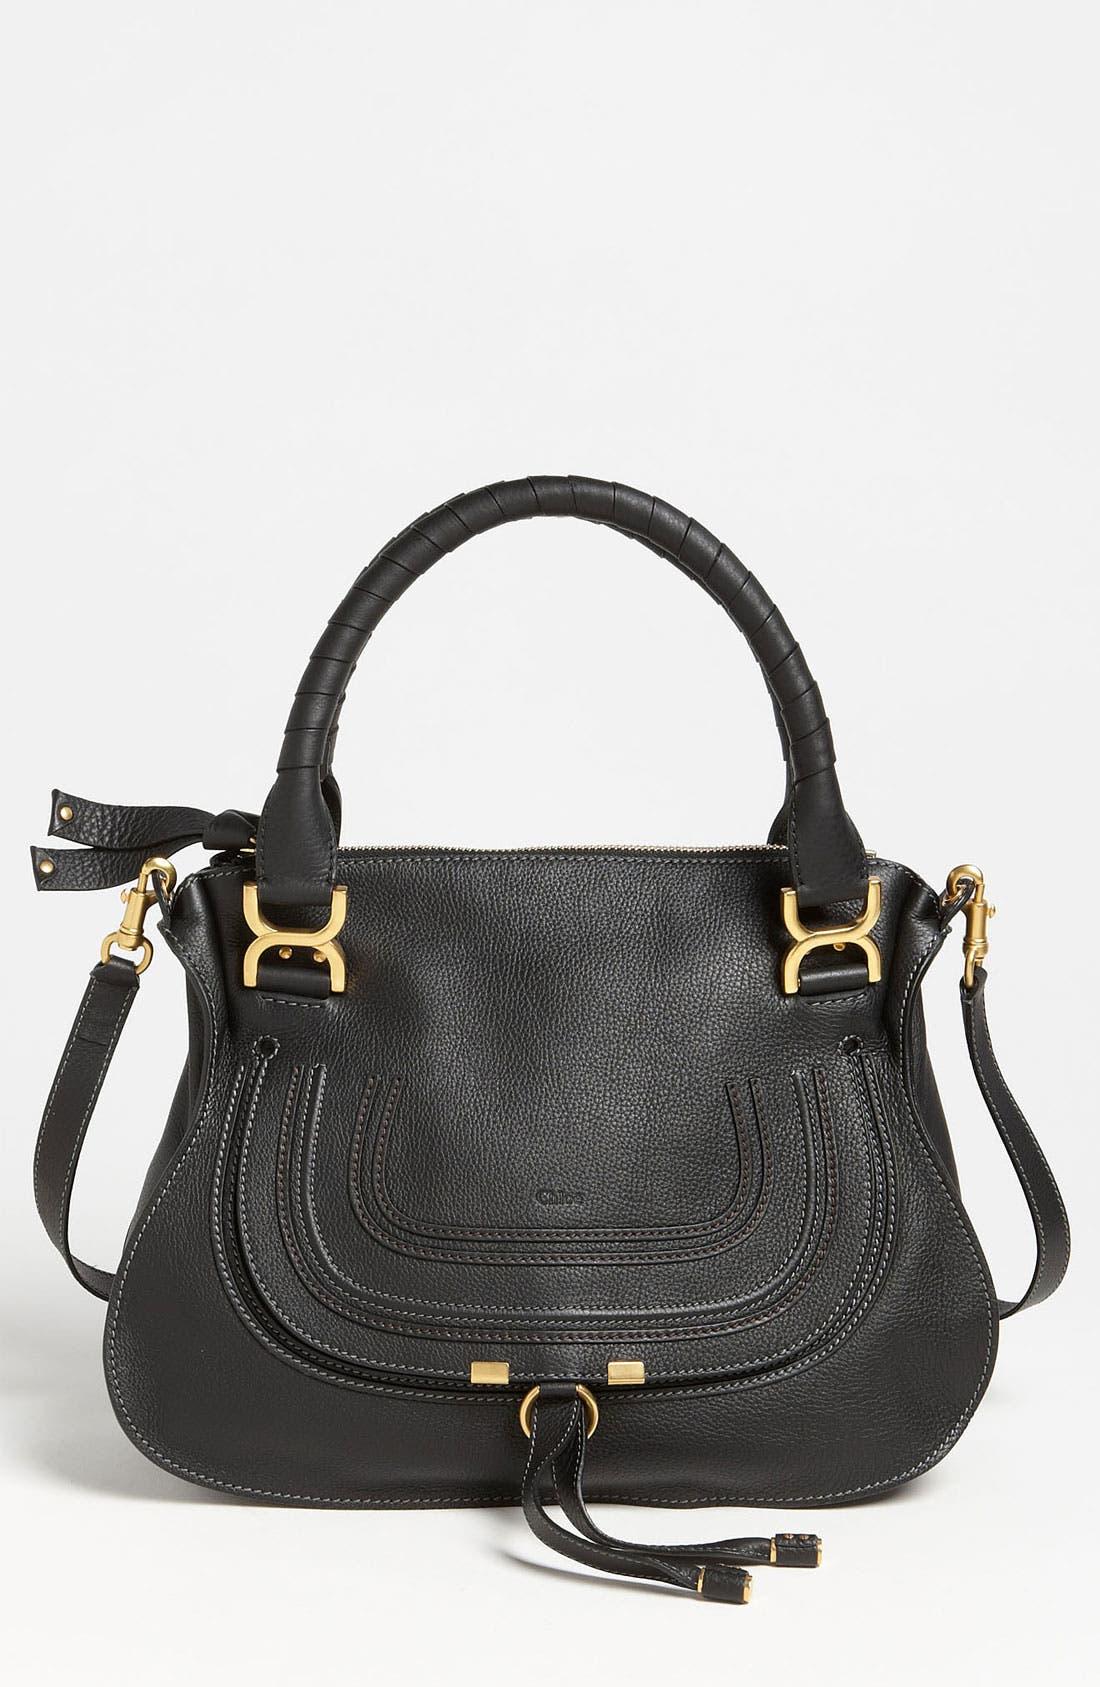 CHLOÉ, 'Medium Marcie' Leather Satchel, Main thumbnail 1, color, BLACK GOLD HRDWRE